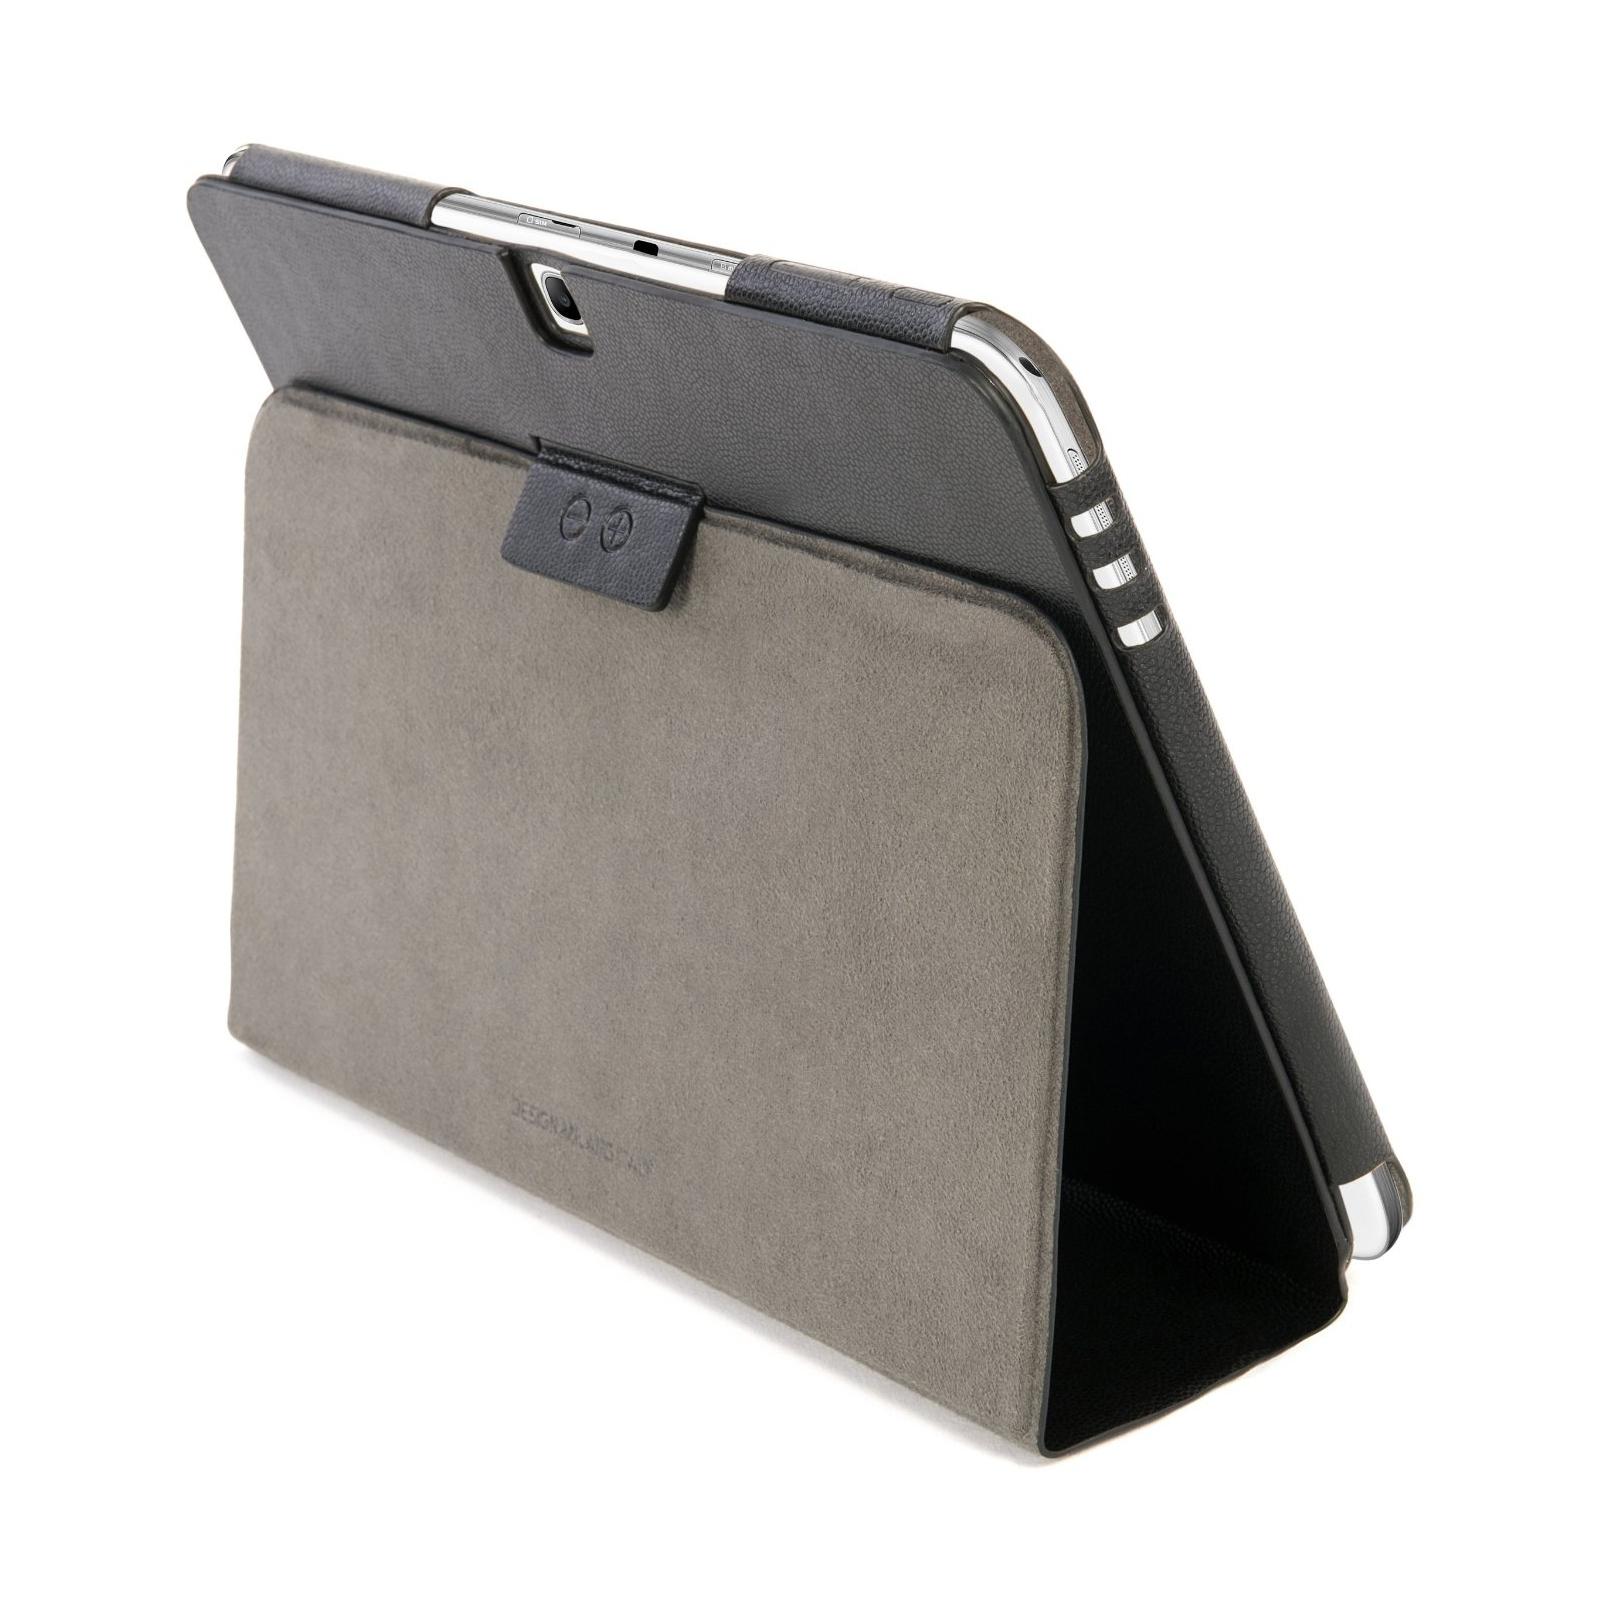 Чехол для планшета Tucano Galaxy Tab 3 10.1 Leggero Black (TAB-LS310) изображение 8